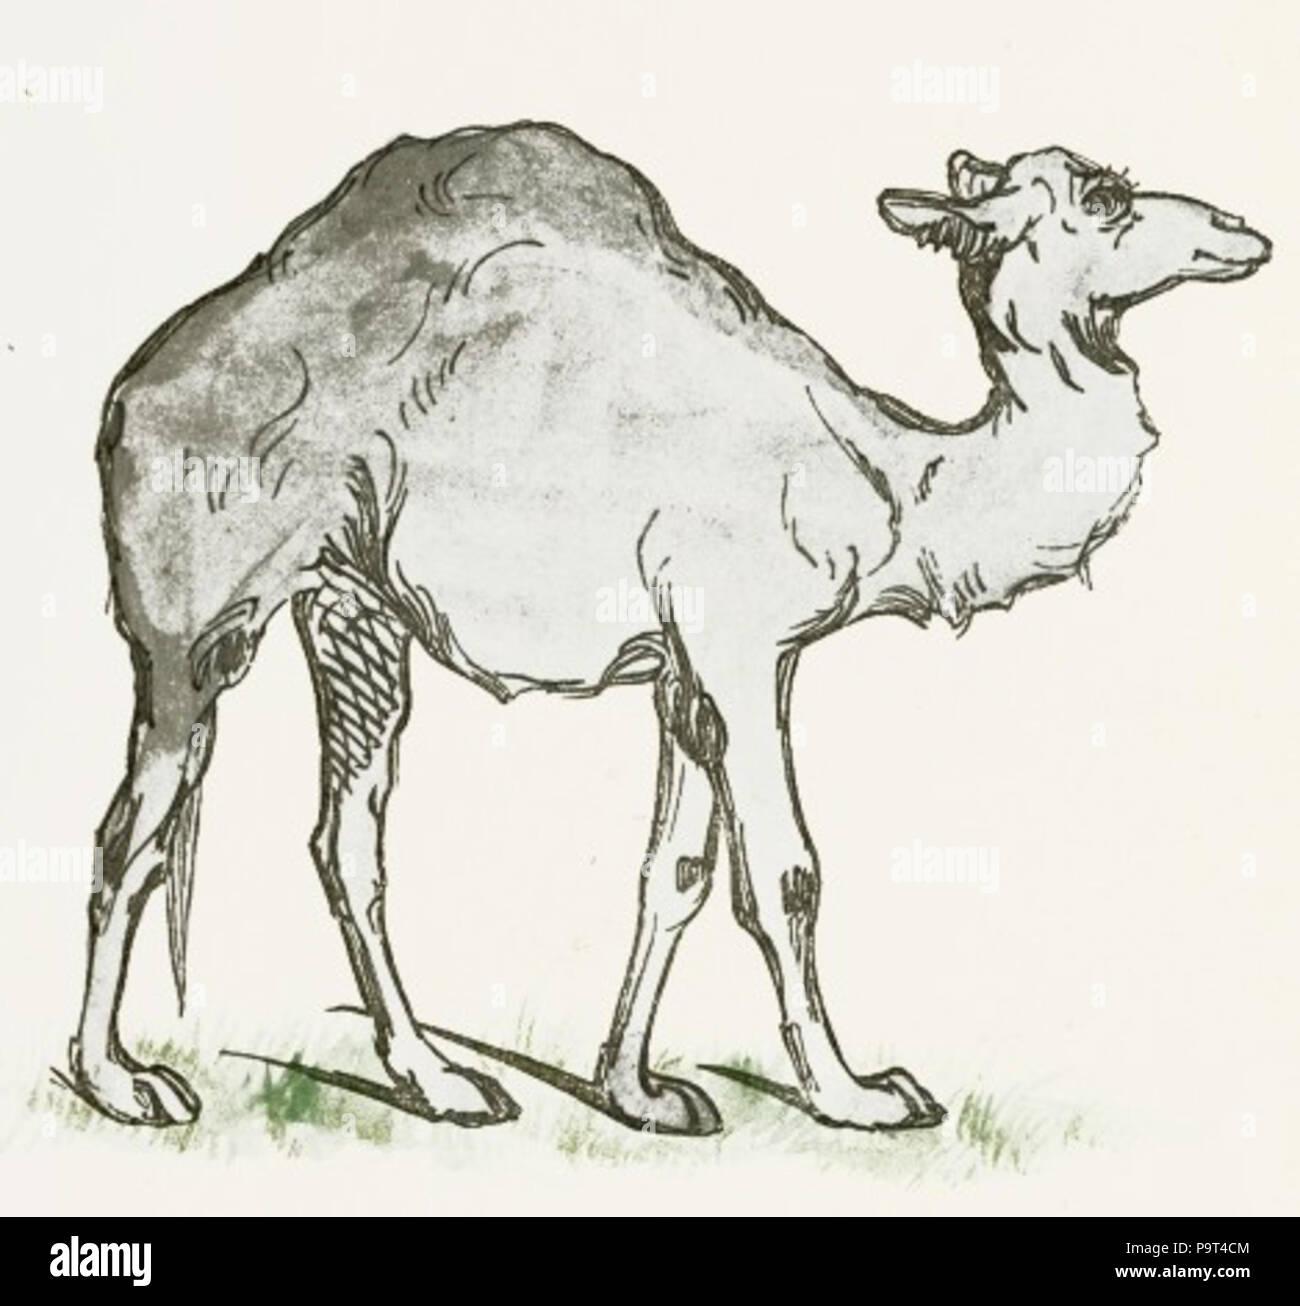 Camel Drawing Stock Photos & Camel Drawing Stock Images - Alamy